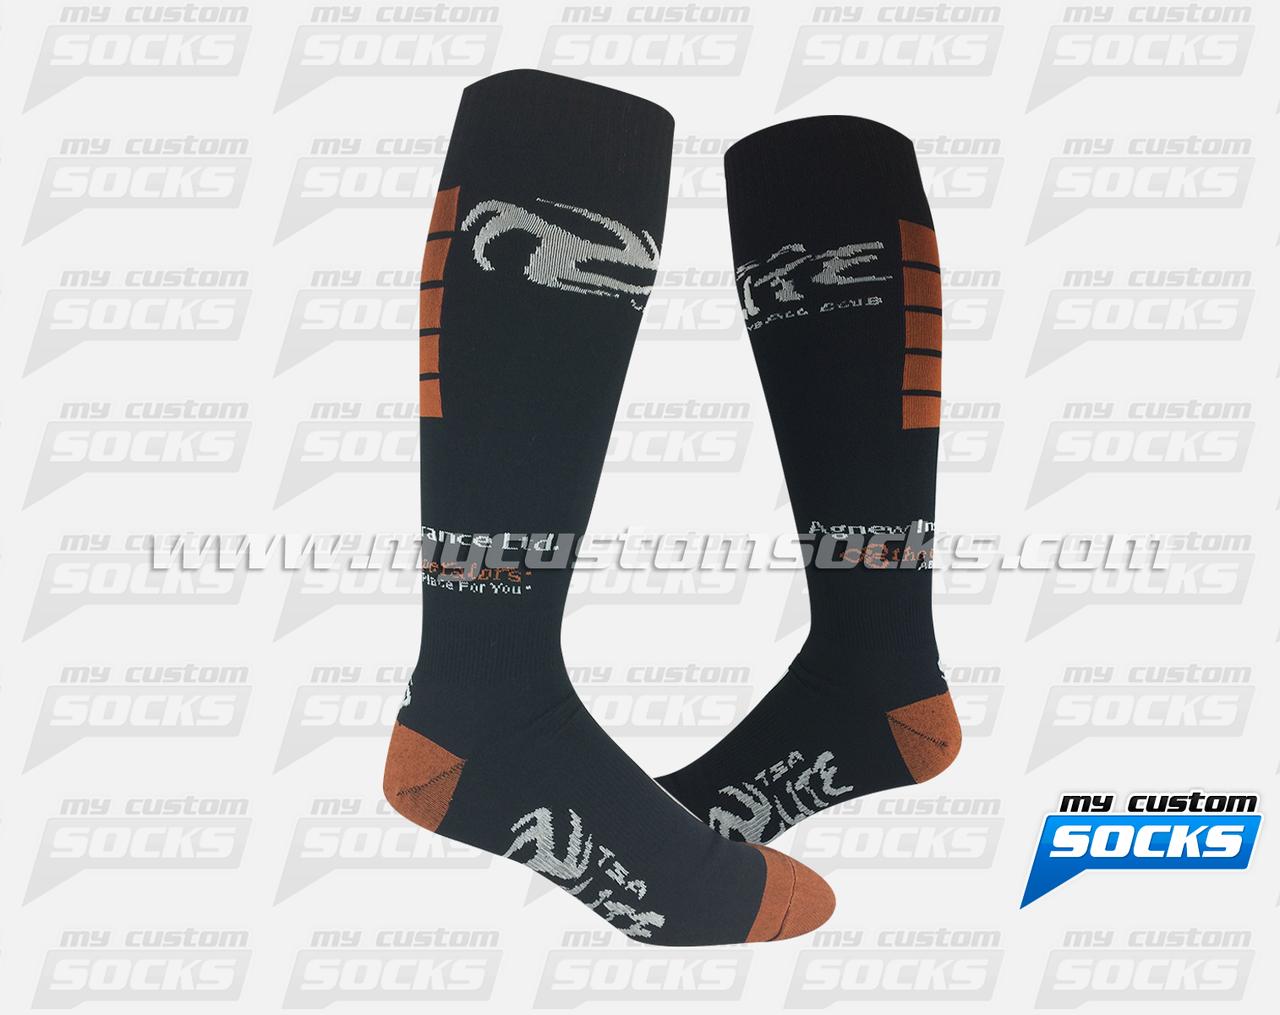 Socks Designed By My Custom Socks For Tsa Elite Volleyball Club In Alberta Canada Volleyball Socks Made With Coolmax Fabric Volle Custom Socks Socks Custom